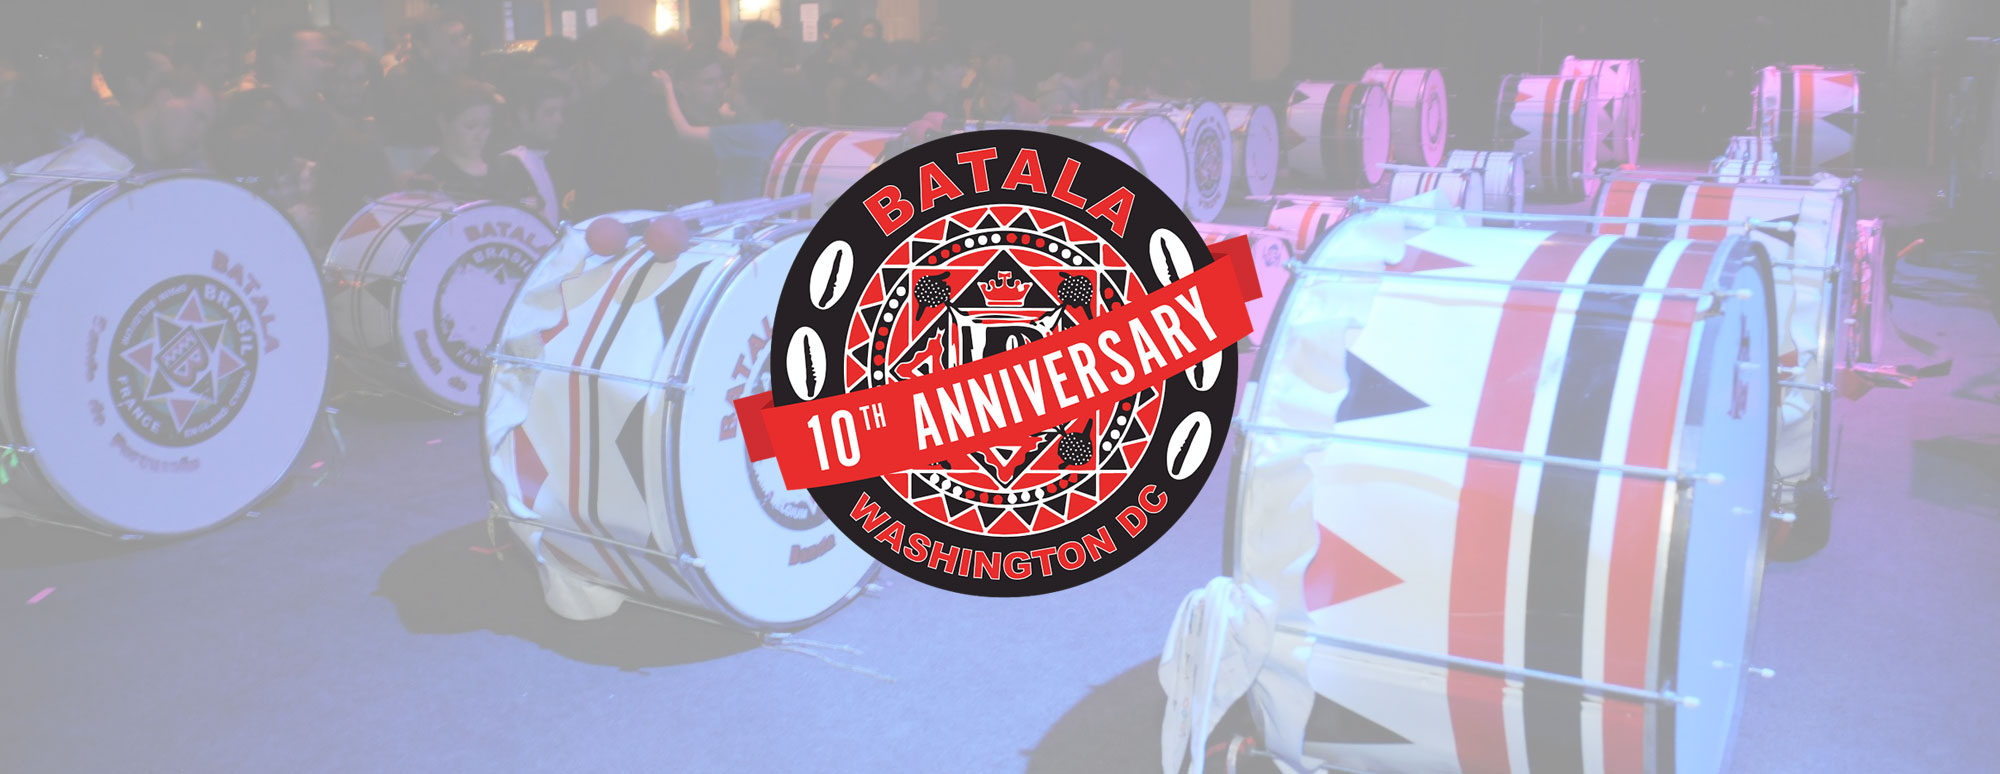 My Batala Story